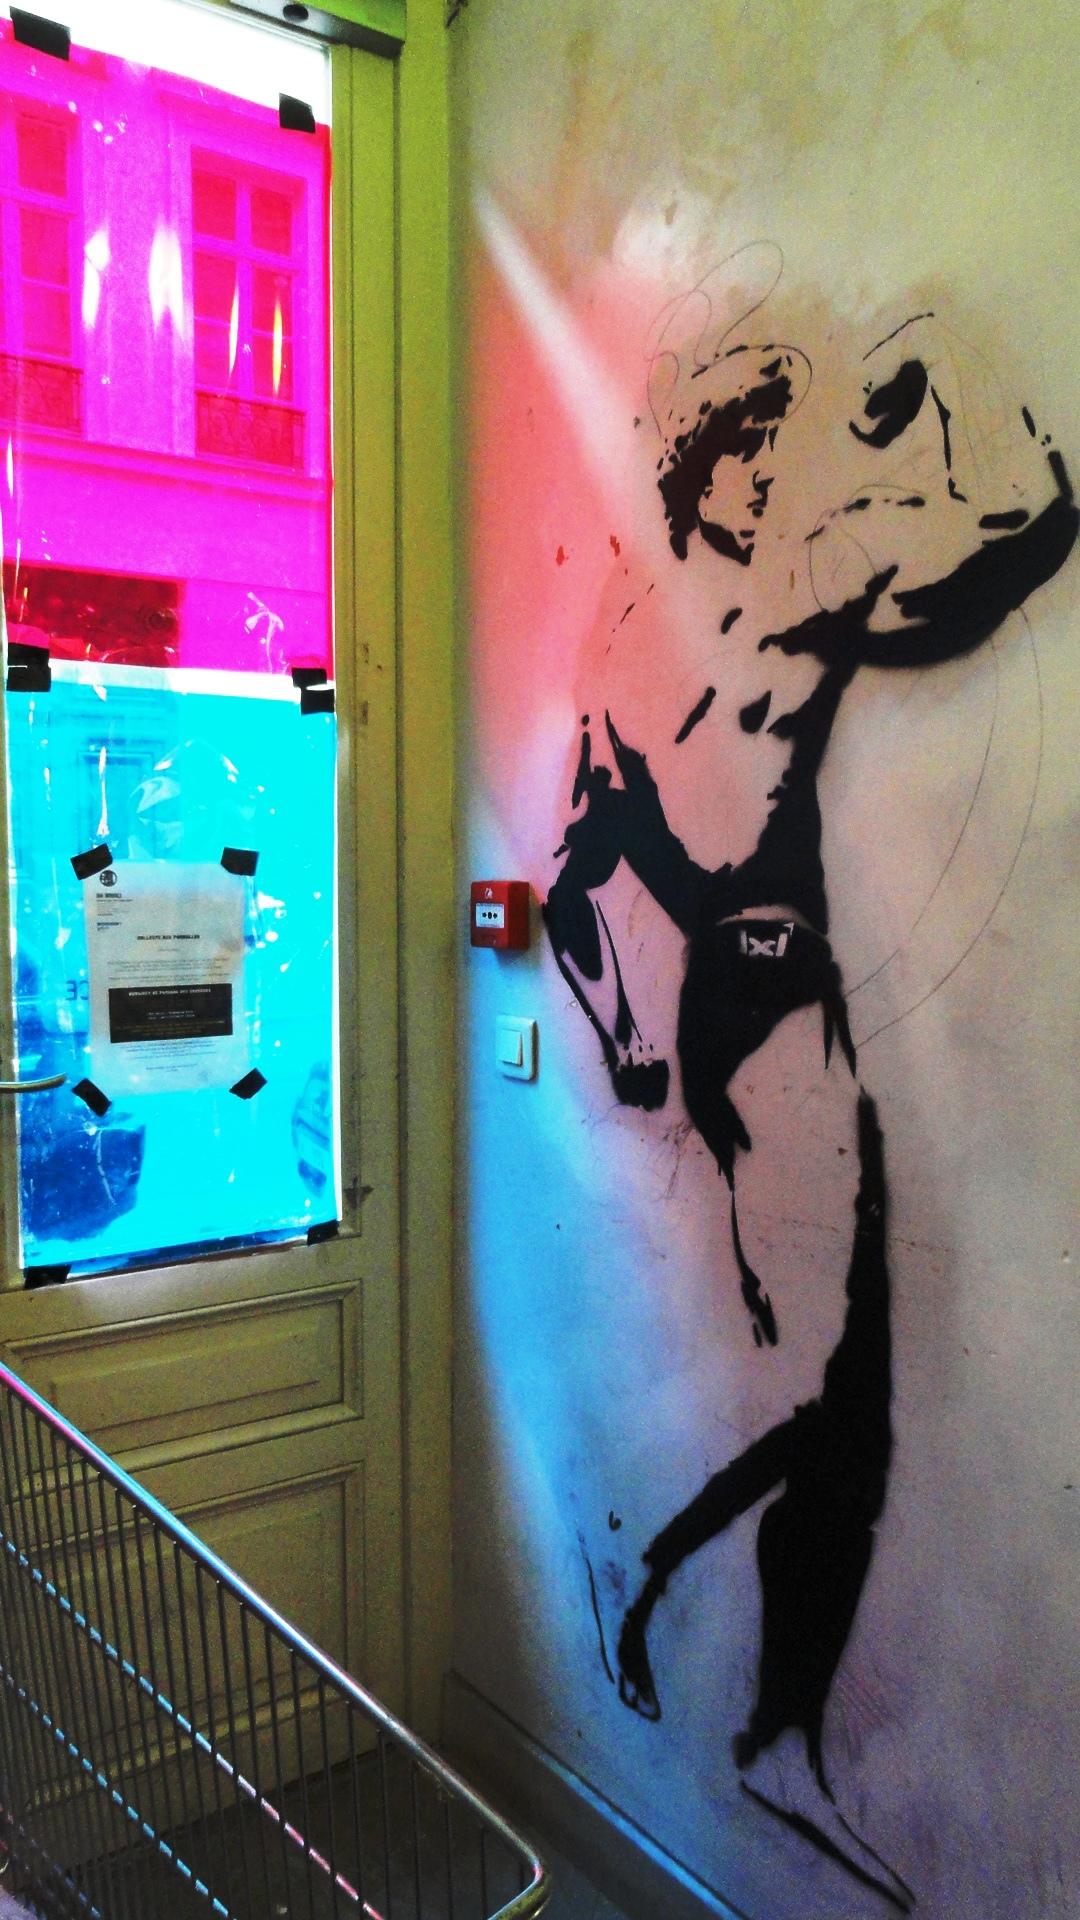 59 rue de Rivoli, Paris 1er